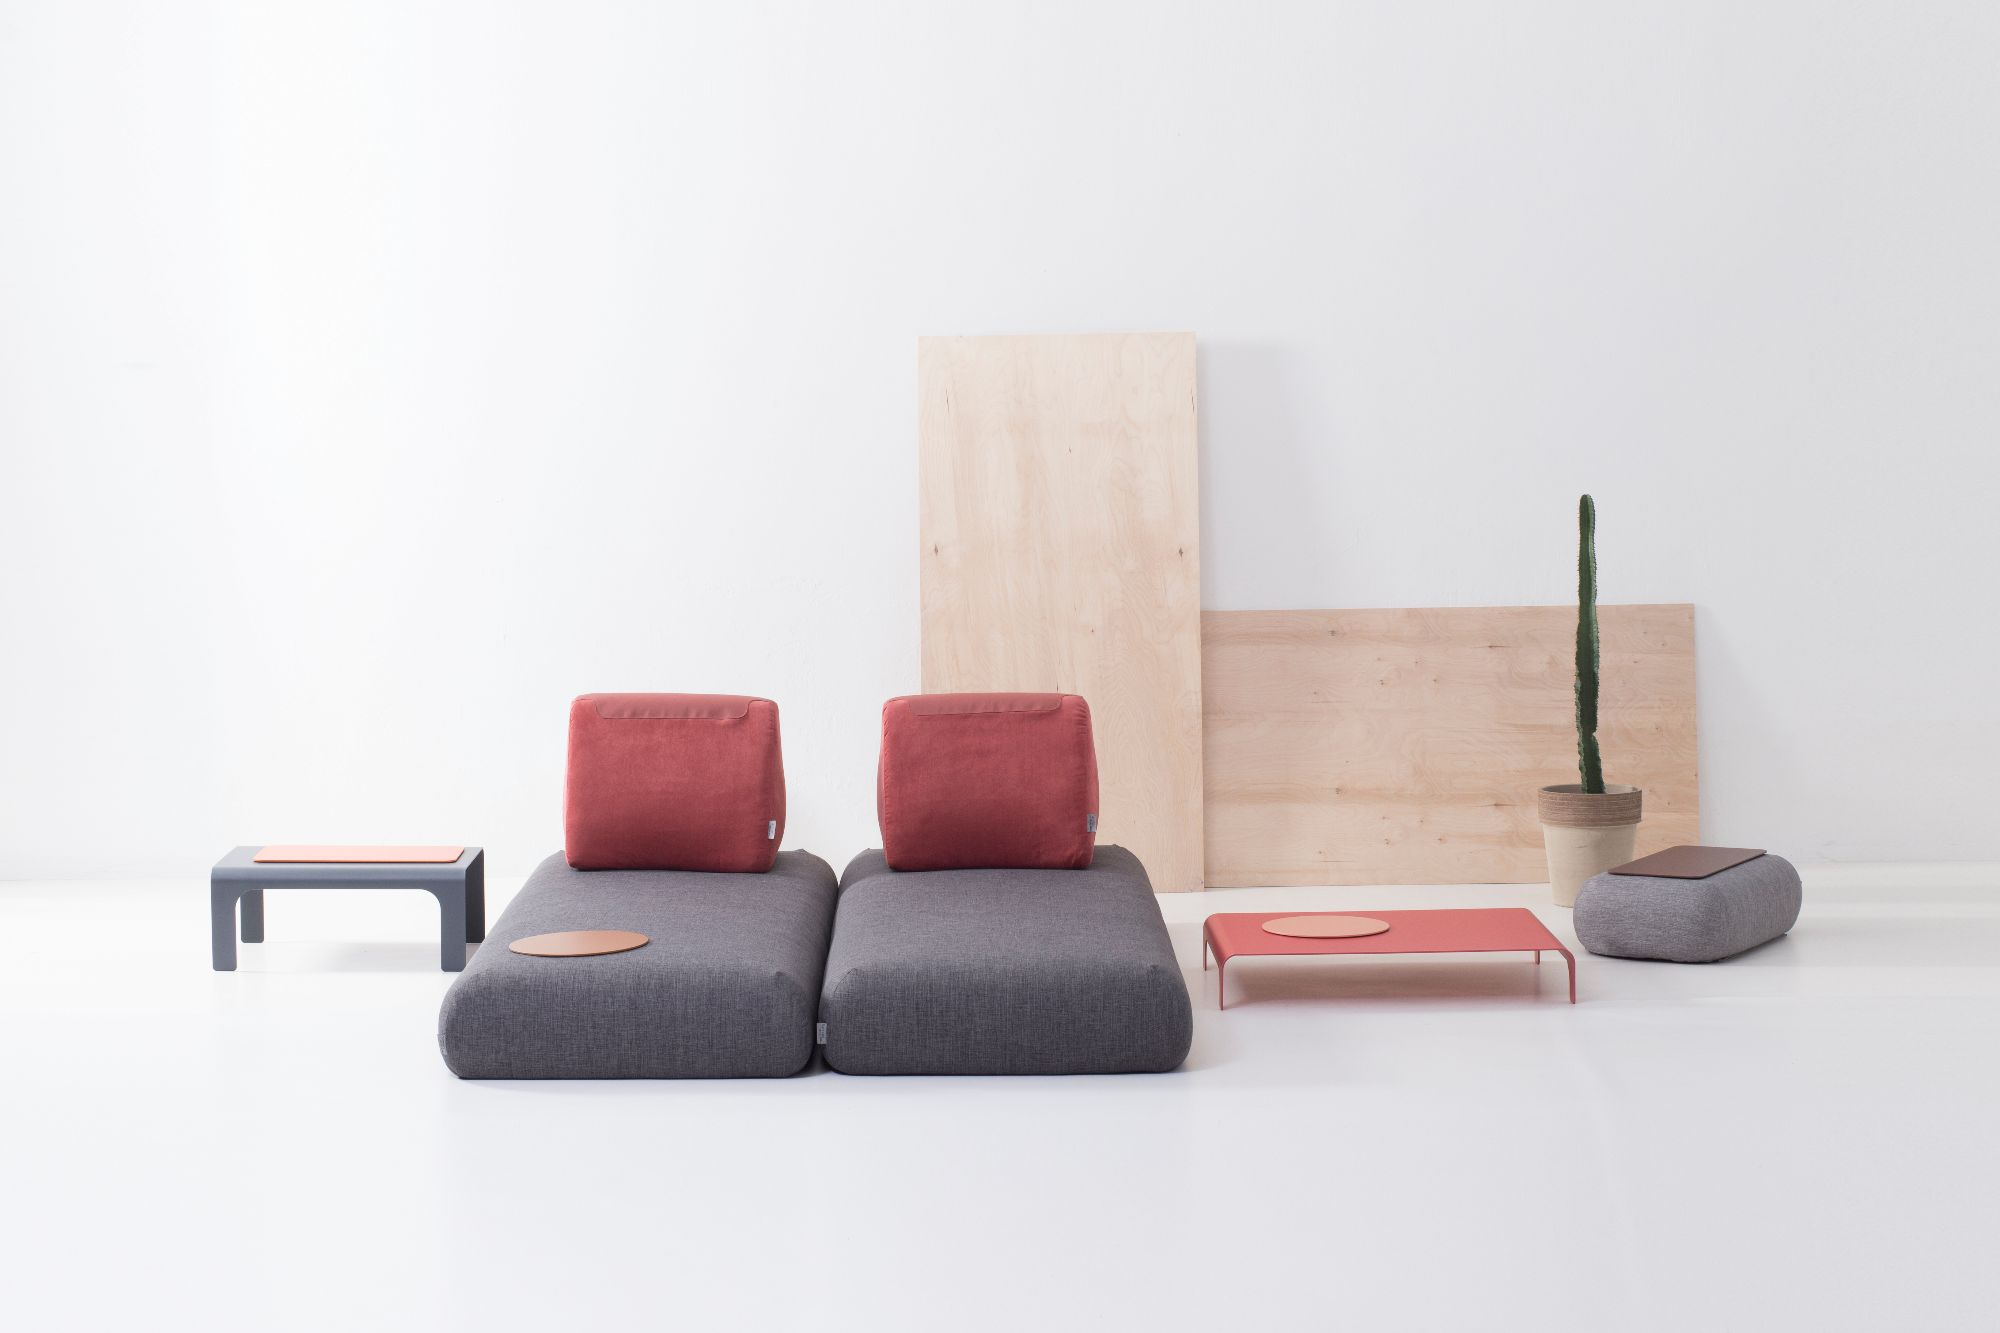 hannabi-box-urban-nomad-mobile-sofa-system-pics-hq-06.jpg